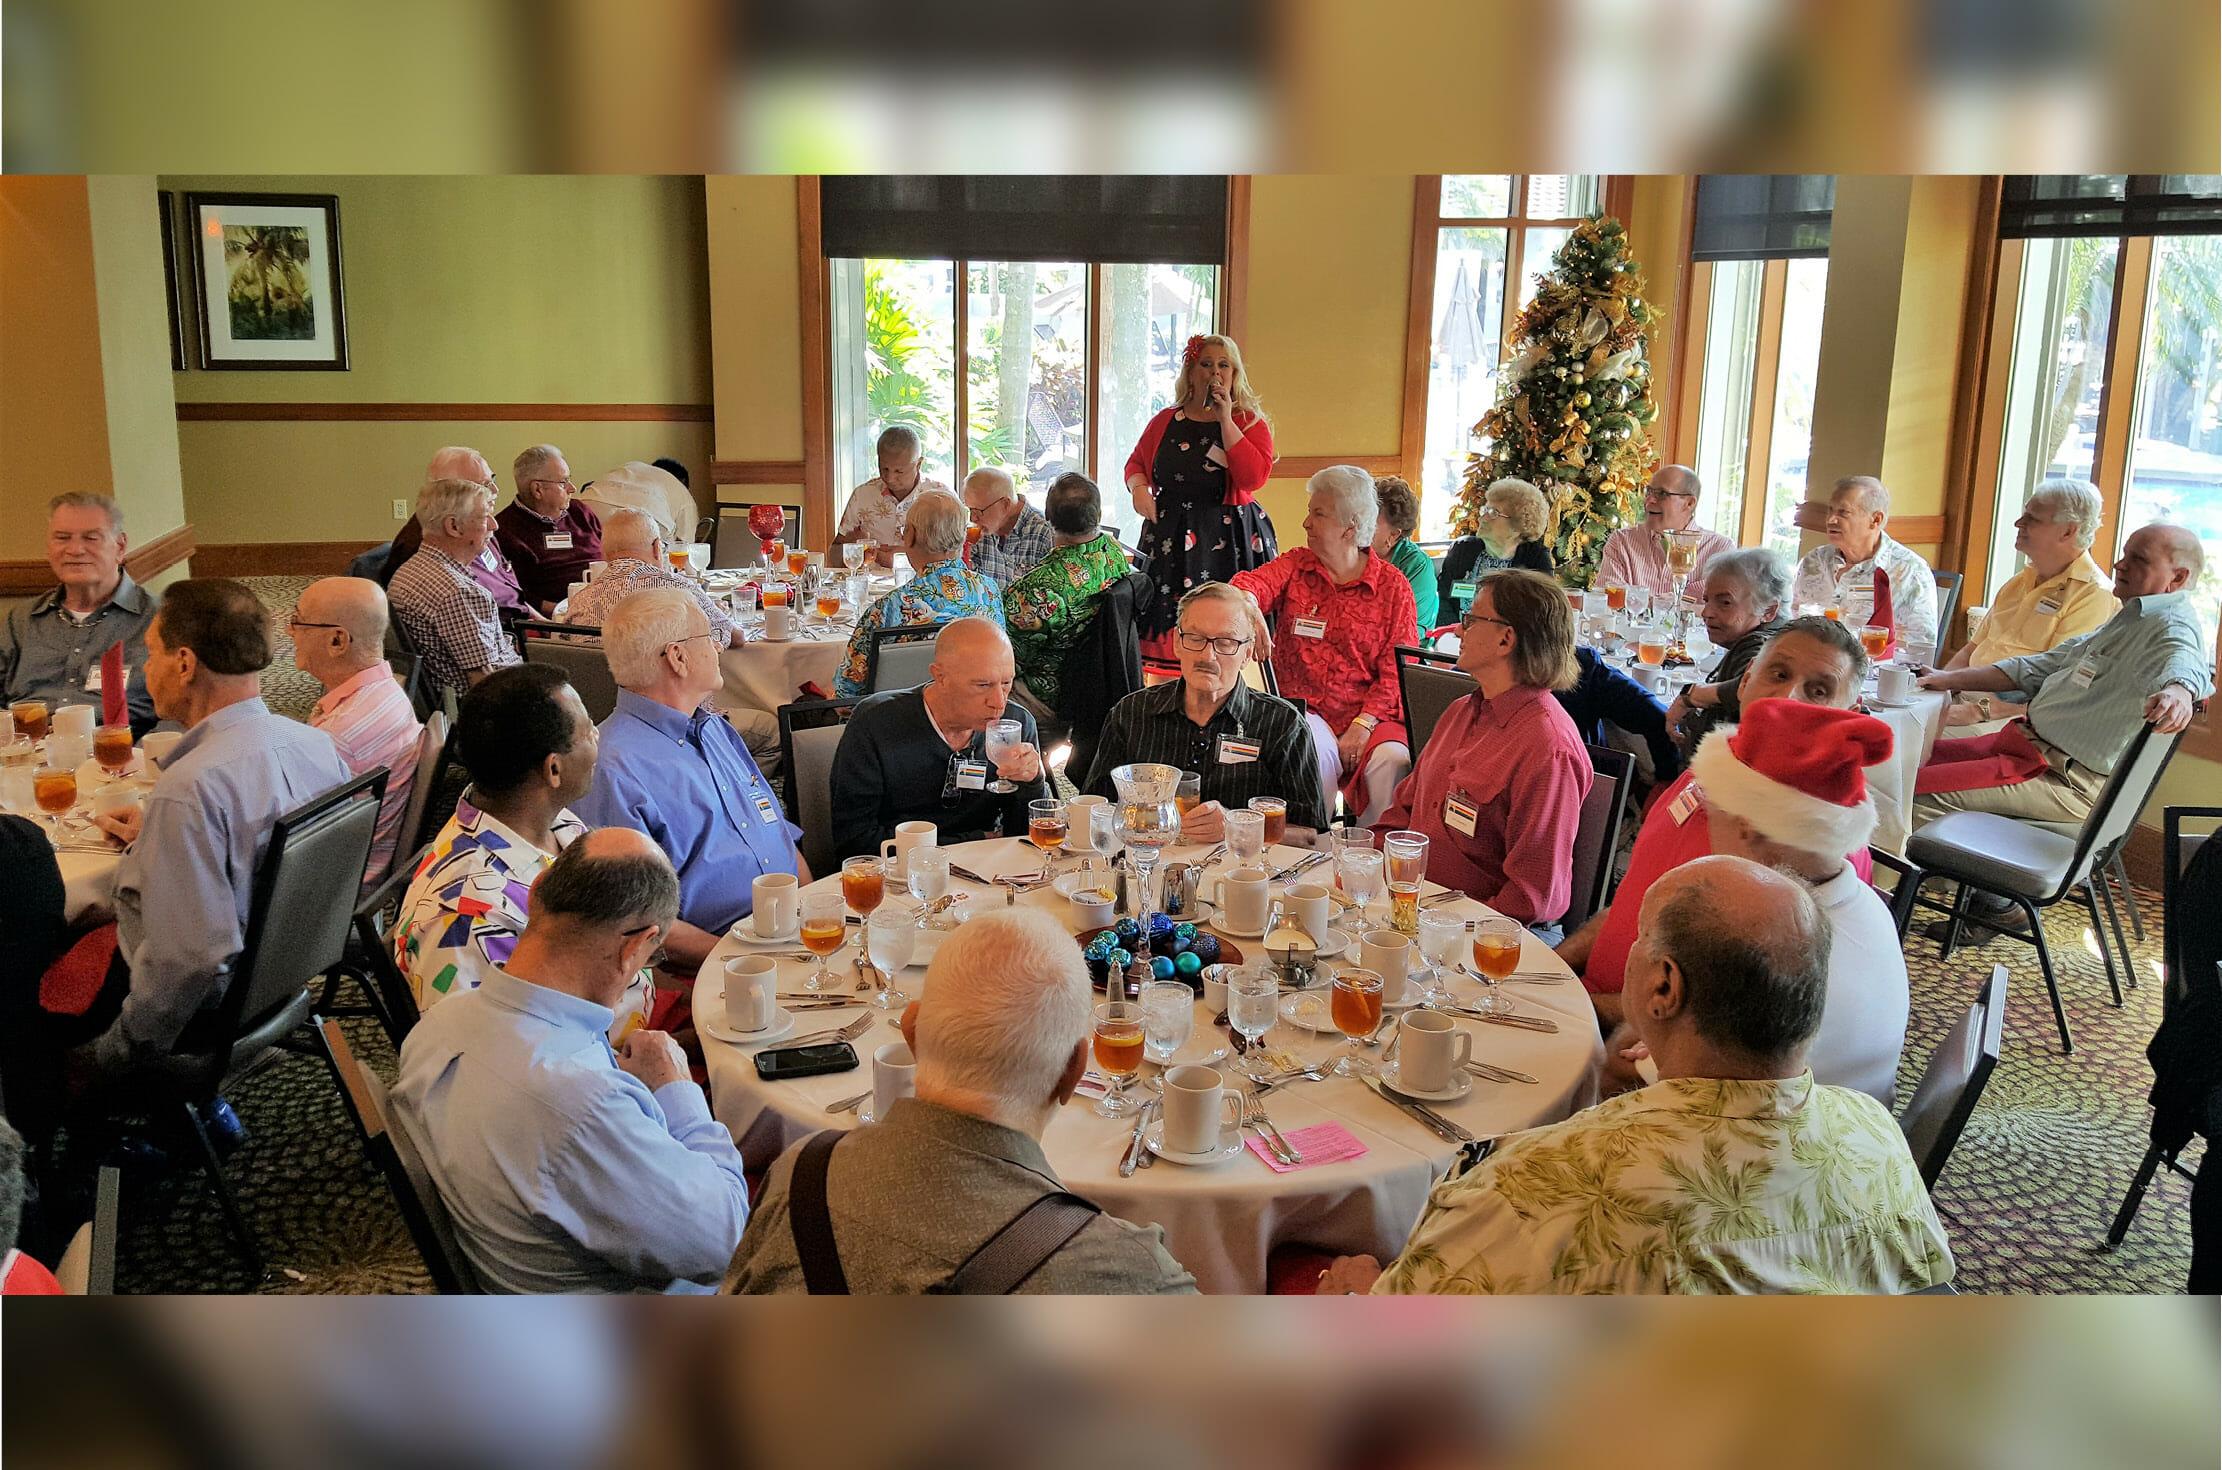 SAGE South Florida Celebrates Its 25th Anniversary